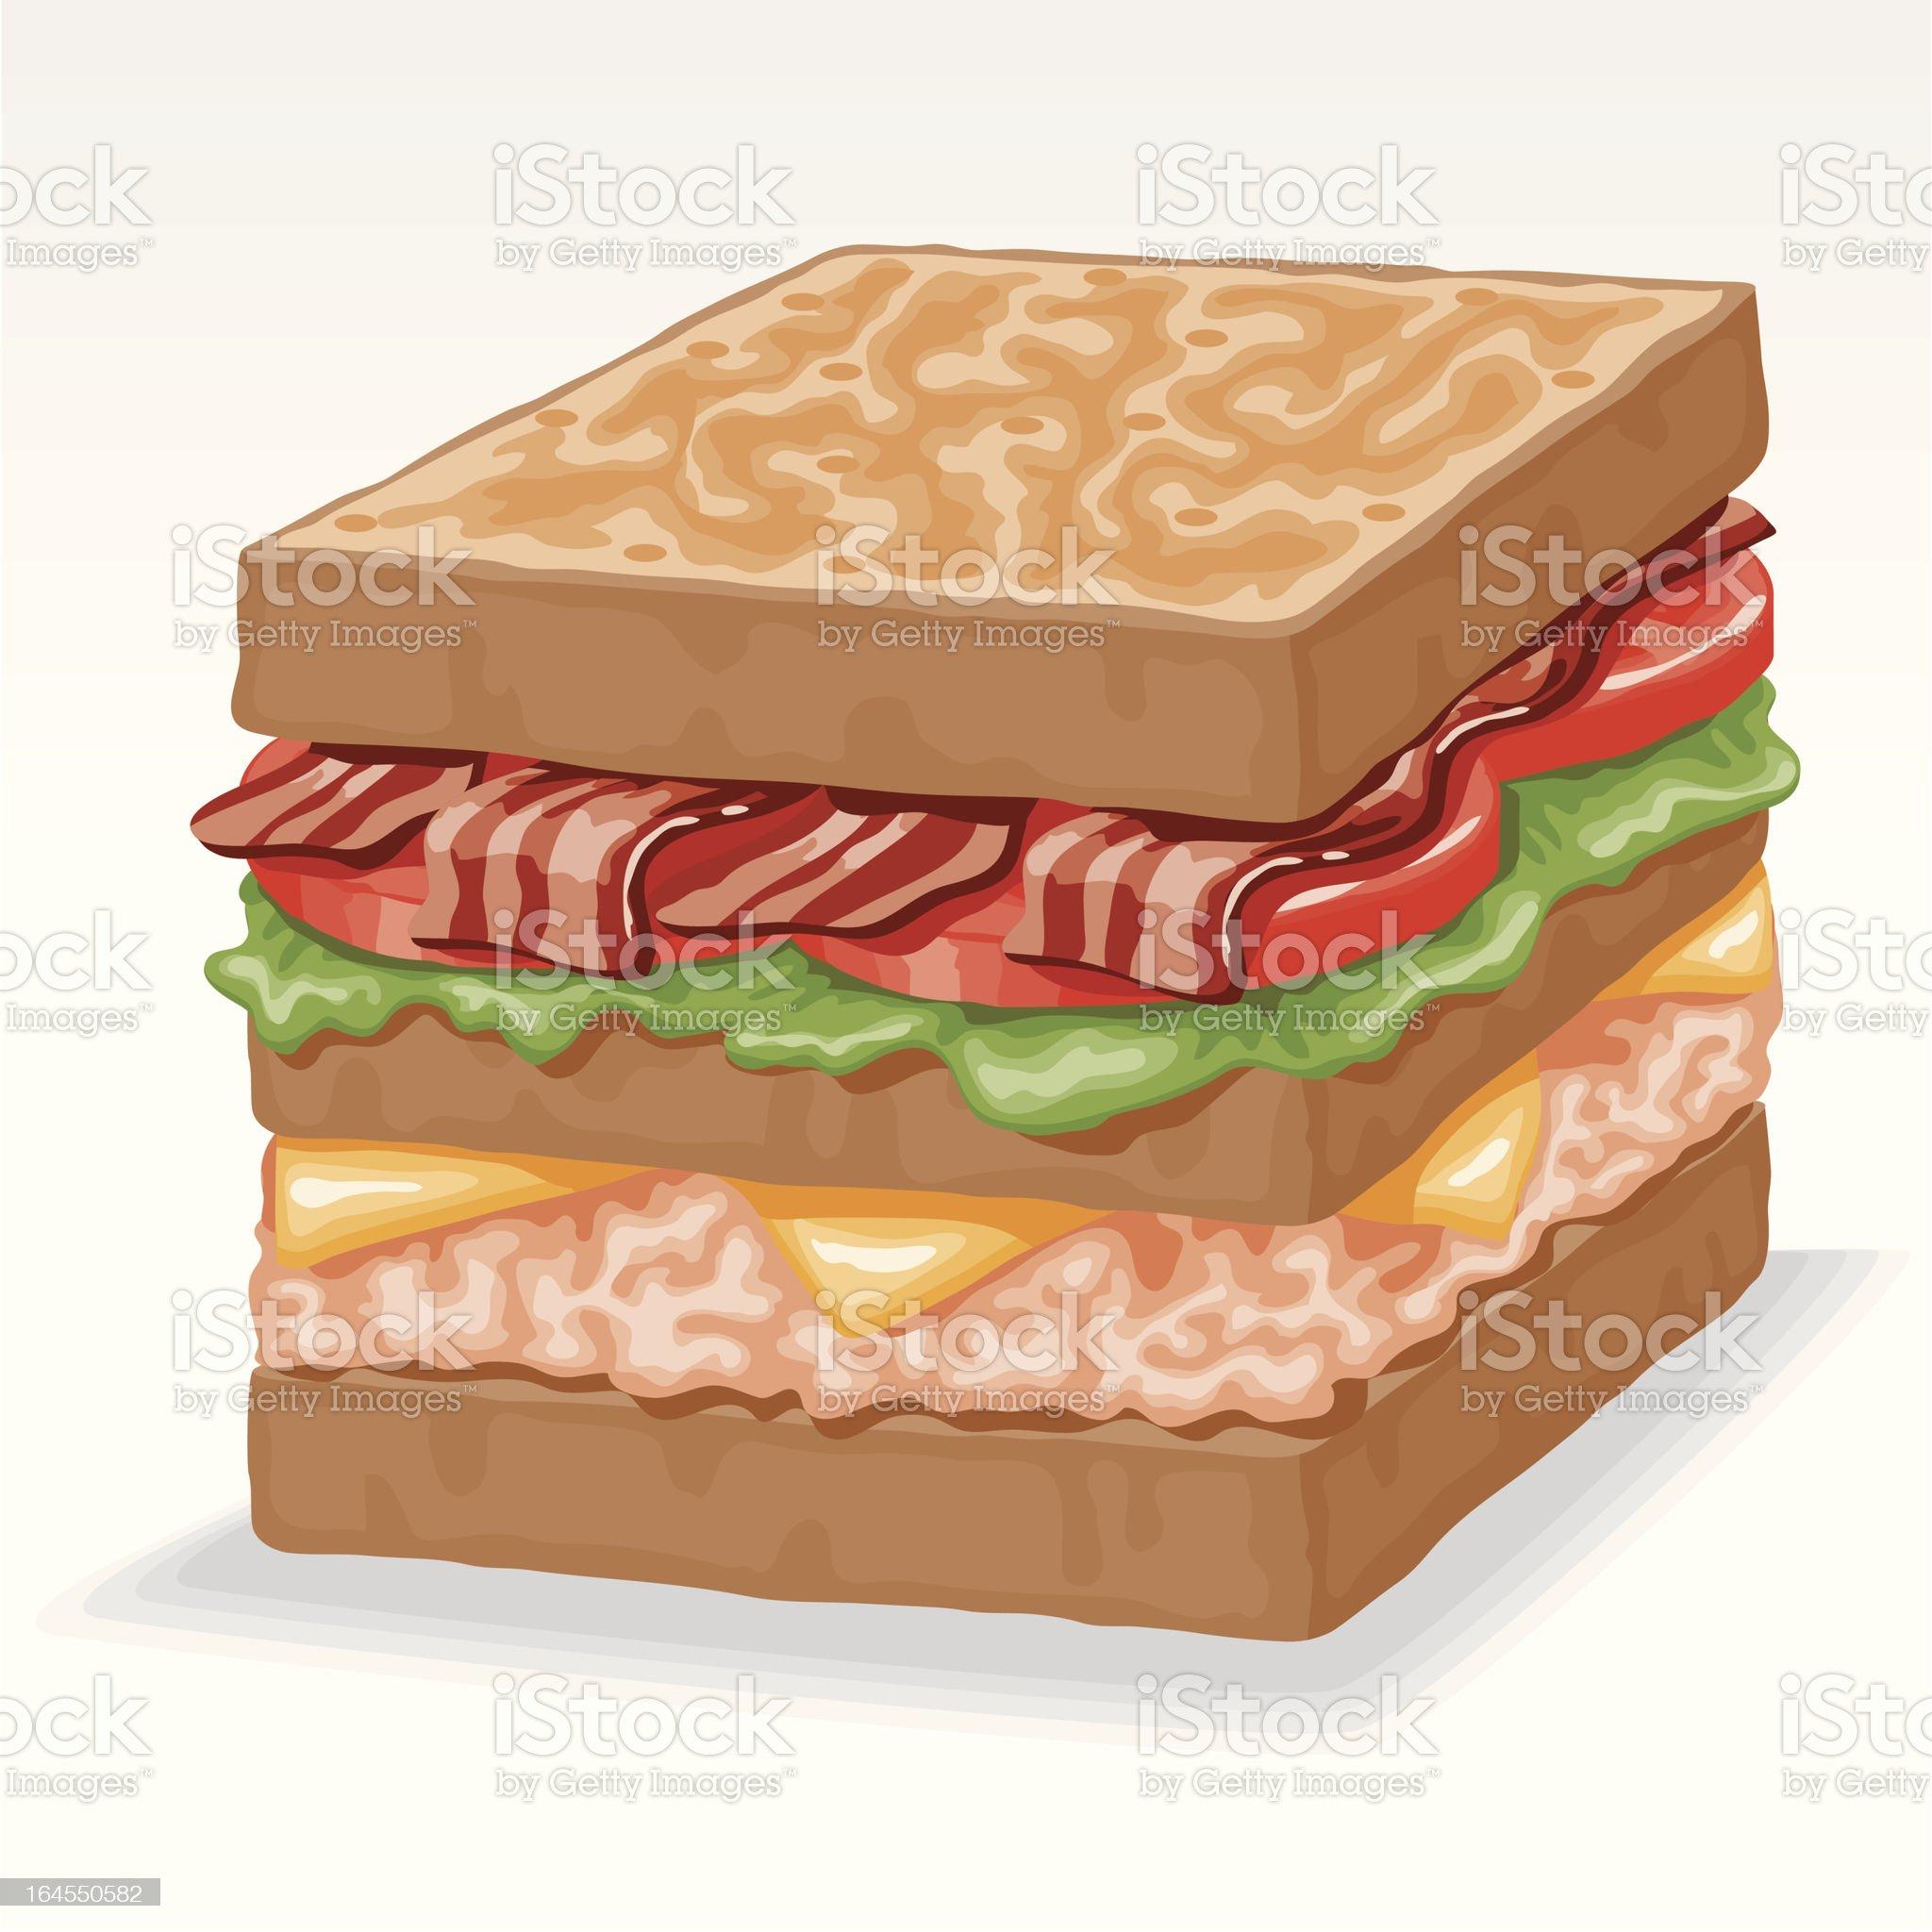 Turkey Club Sandwich royalty-free stock vector art